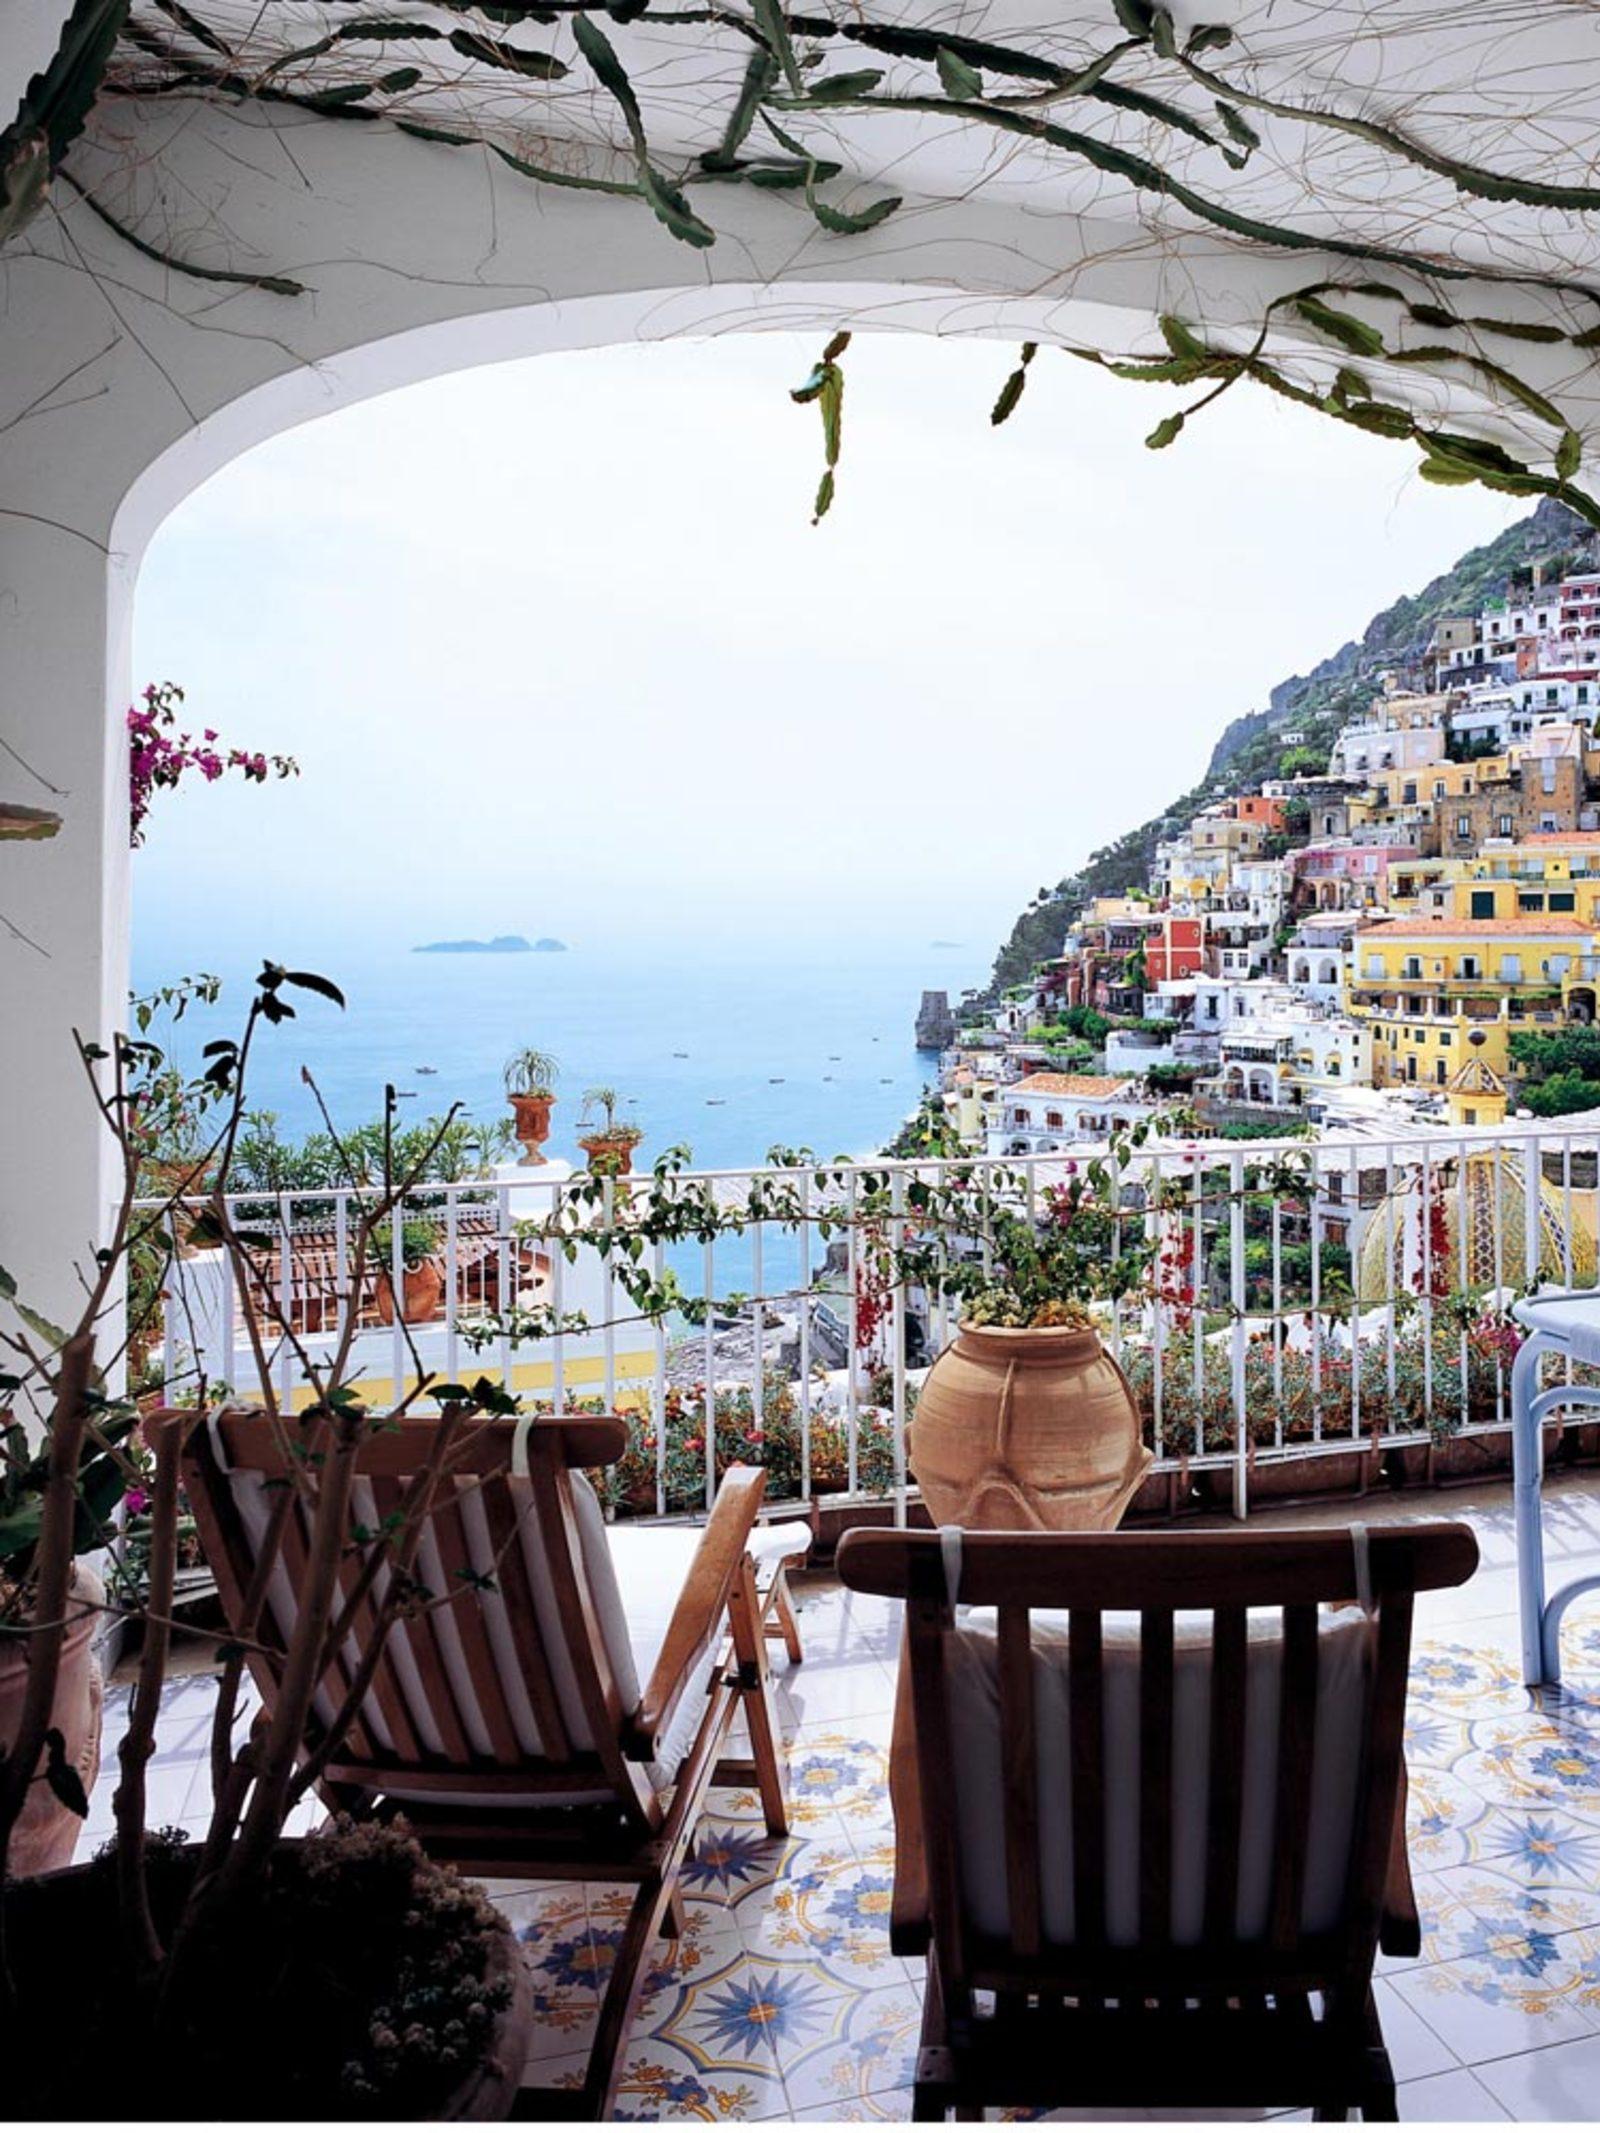 The world's best balconies